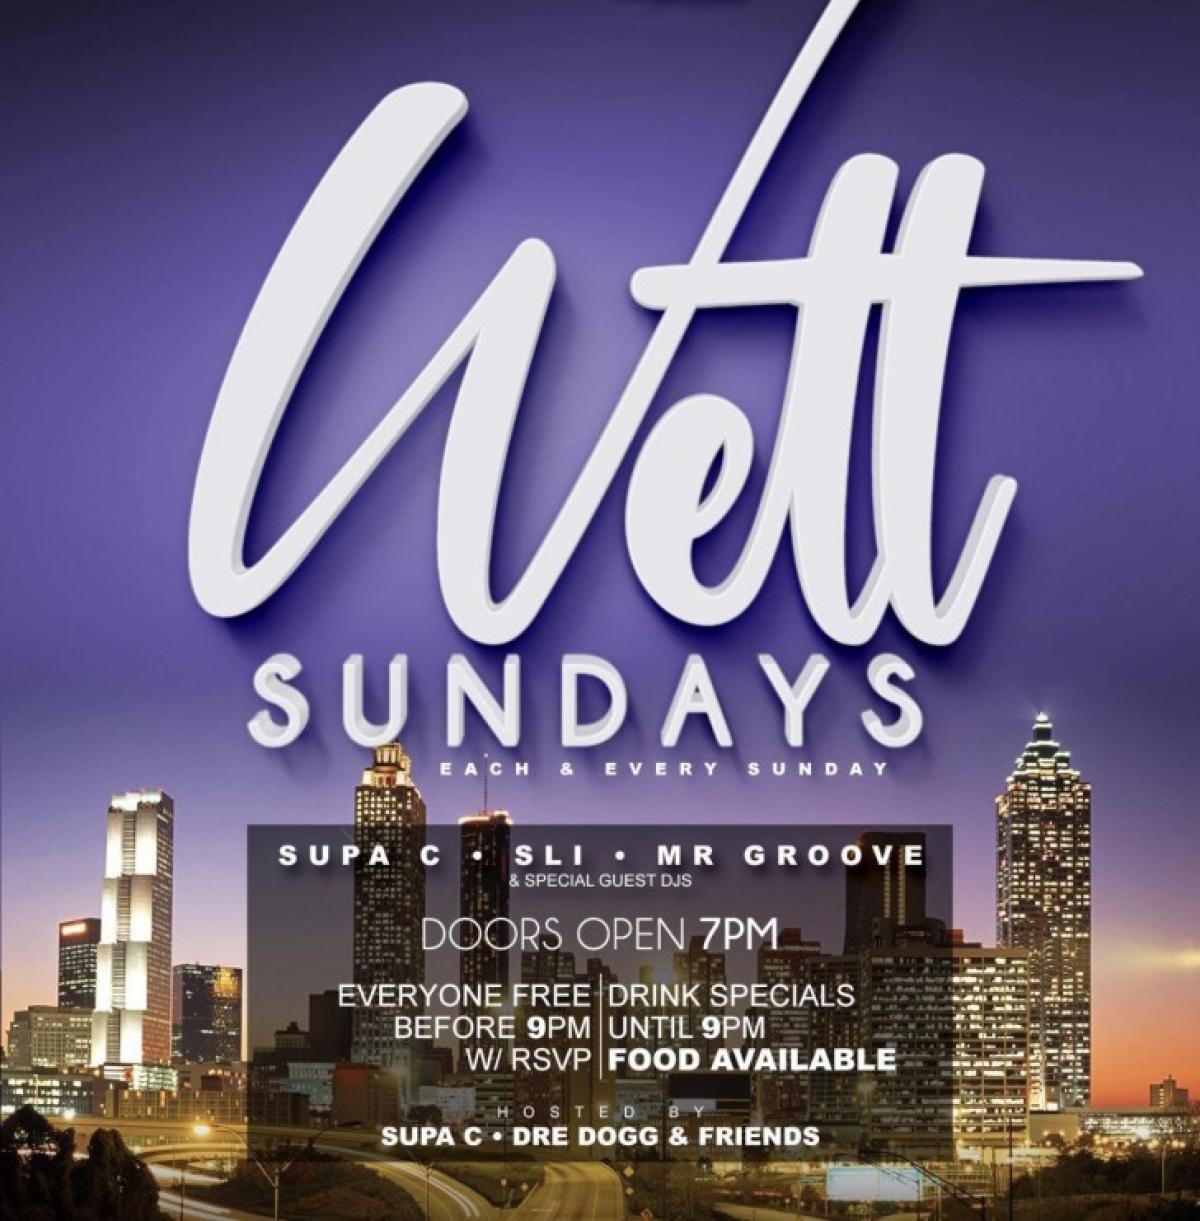 Wett Sundays flyer or graphic.